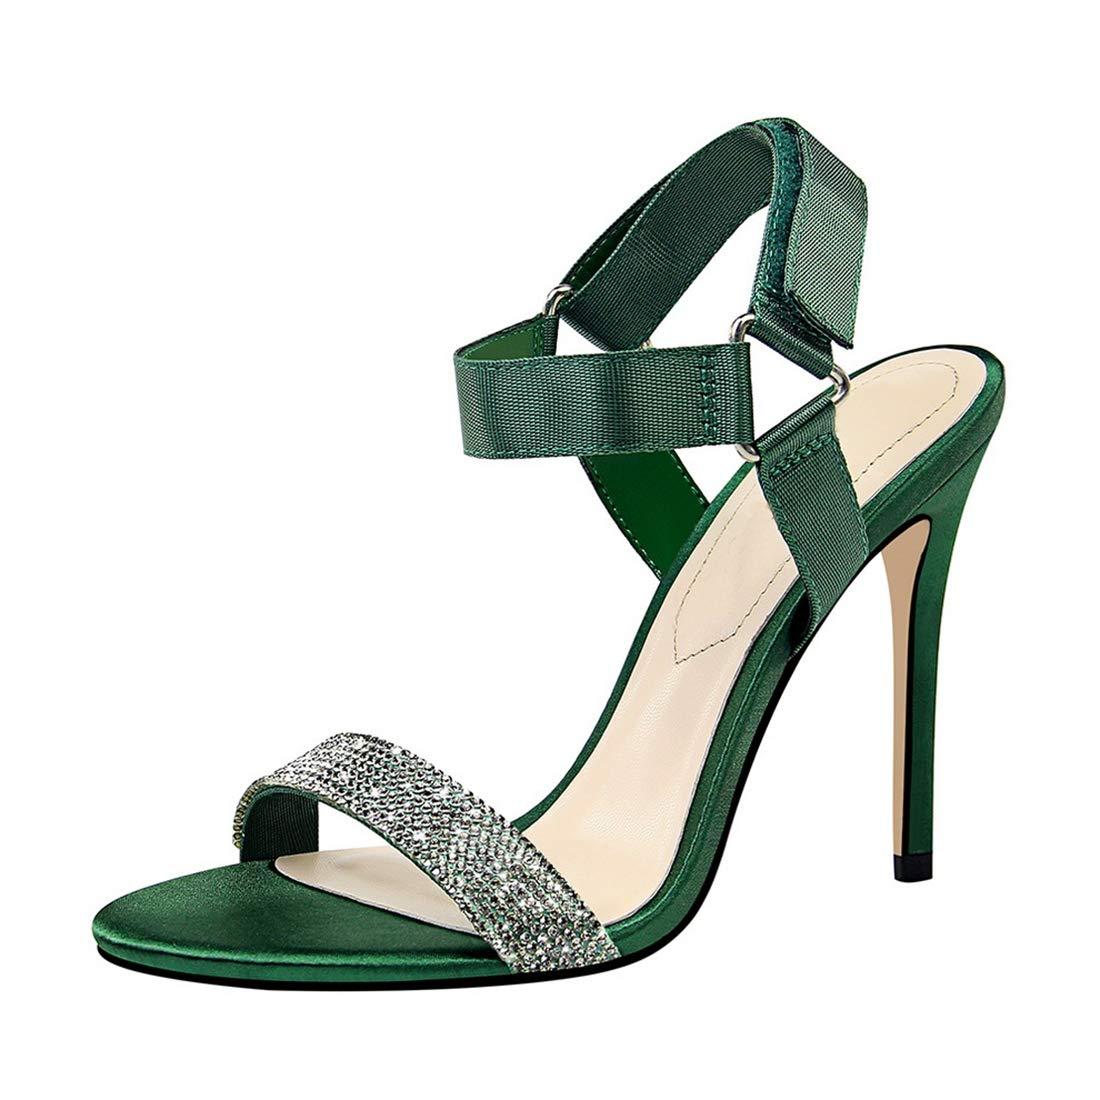 MGM-Joymod , Mules , B06XDKVPVG Green Femme Green dcd4ace - fast-weightloss-diet.space